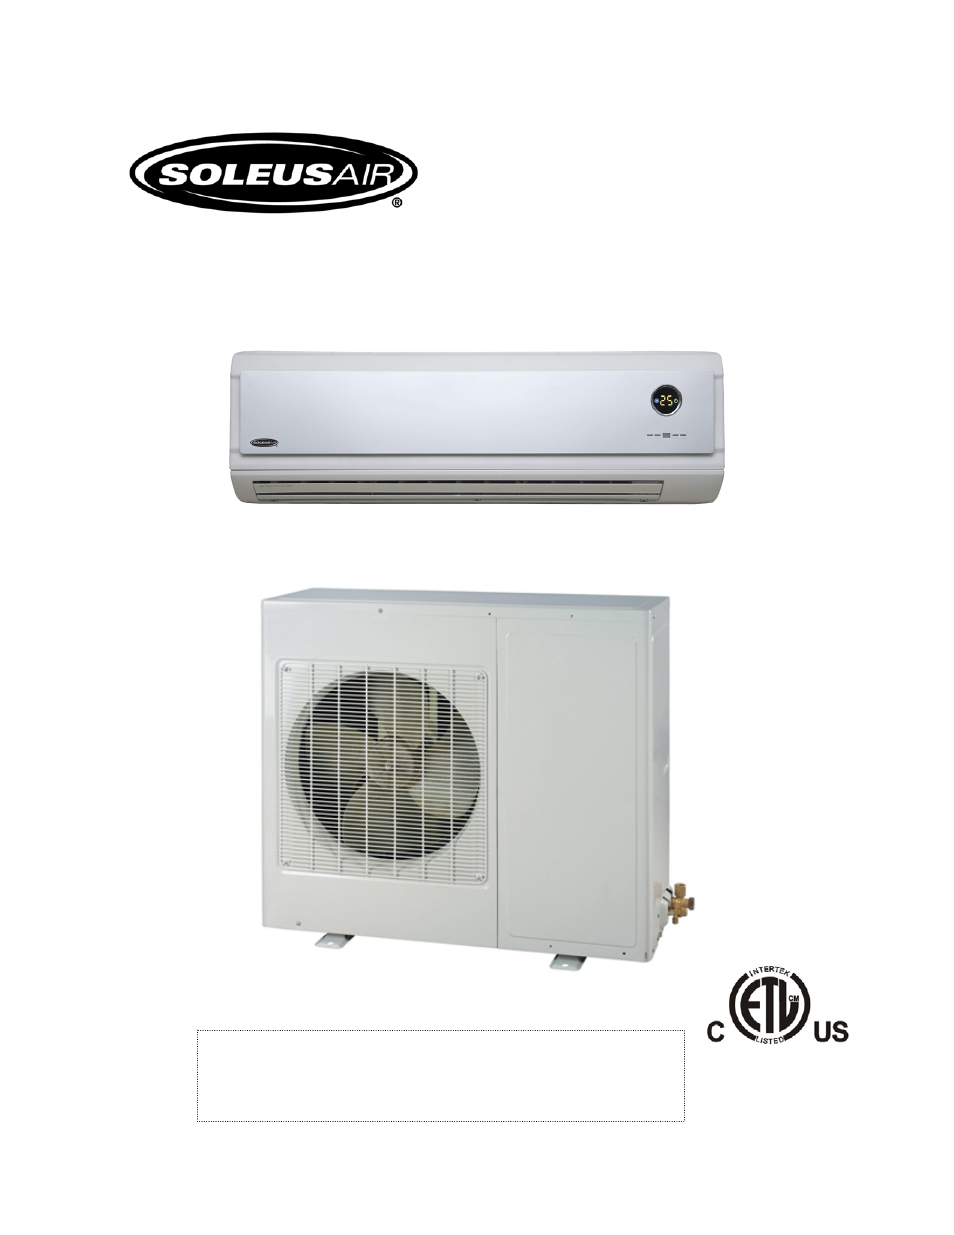 soleus air kfhhp 12 od user manual 26 pages also for kfihp 09 rh manualsdir com Friedrich Split Air Conditioners Friedrich Split Air Conditioners